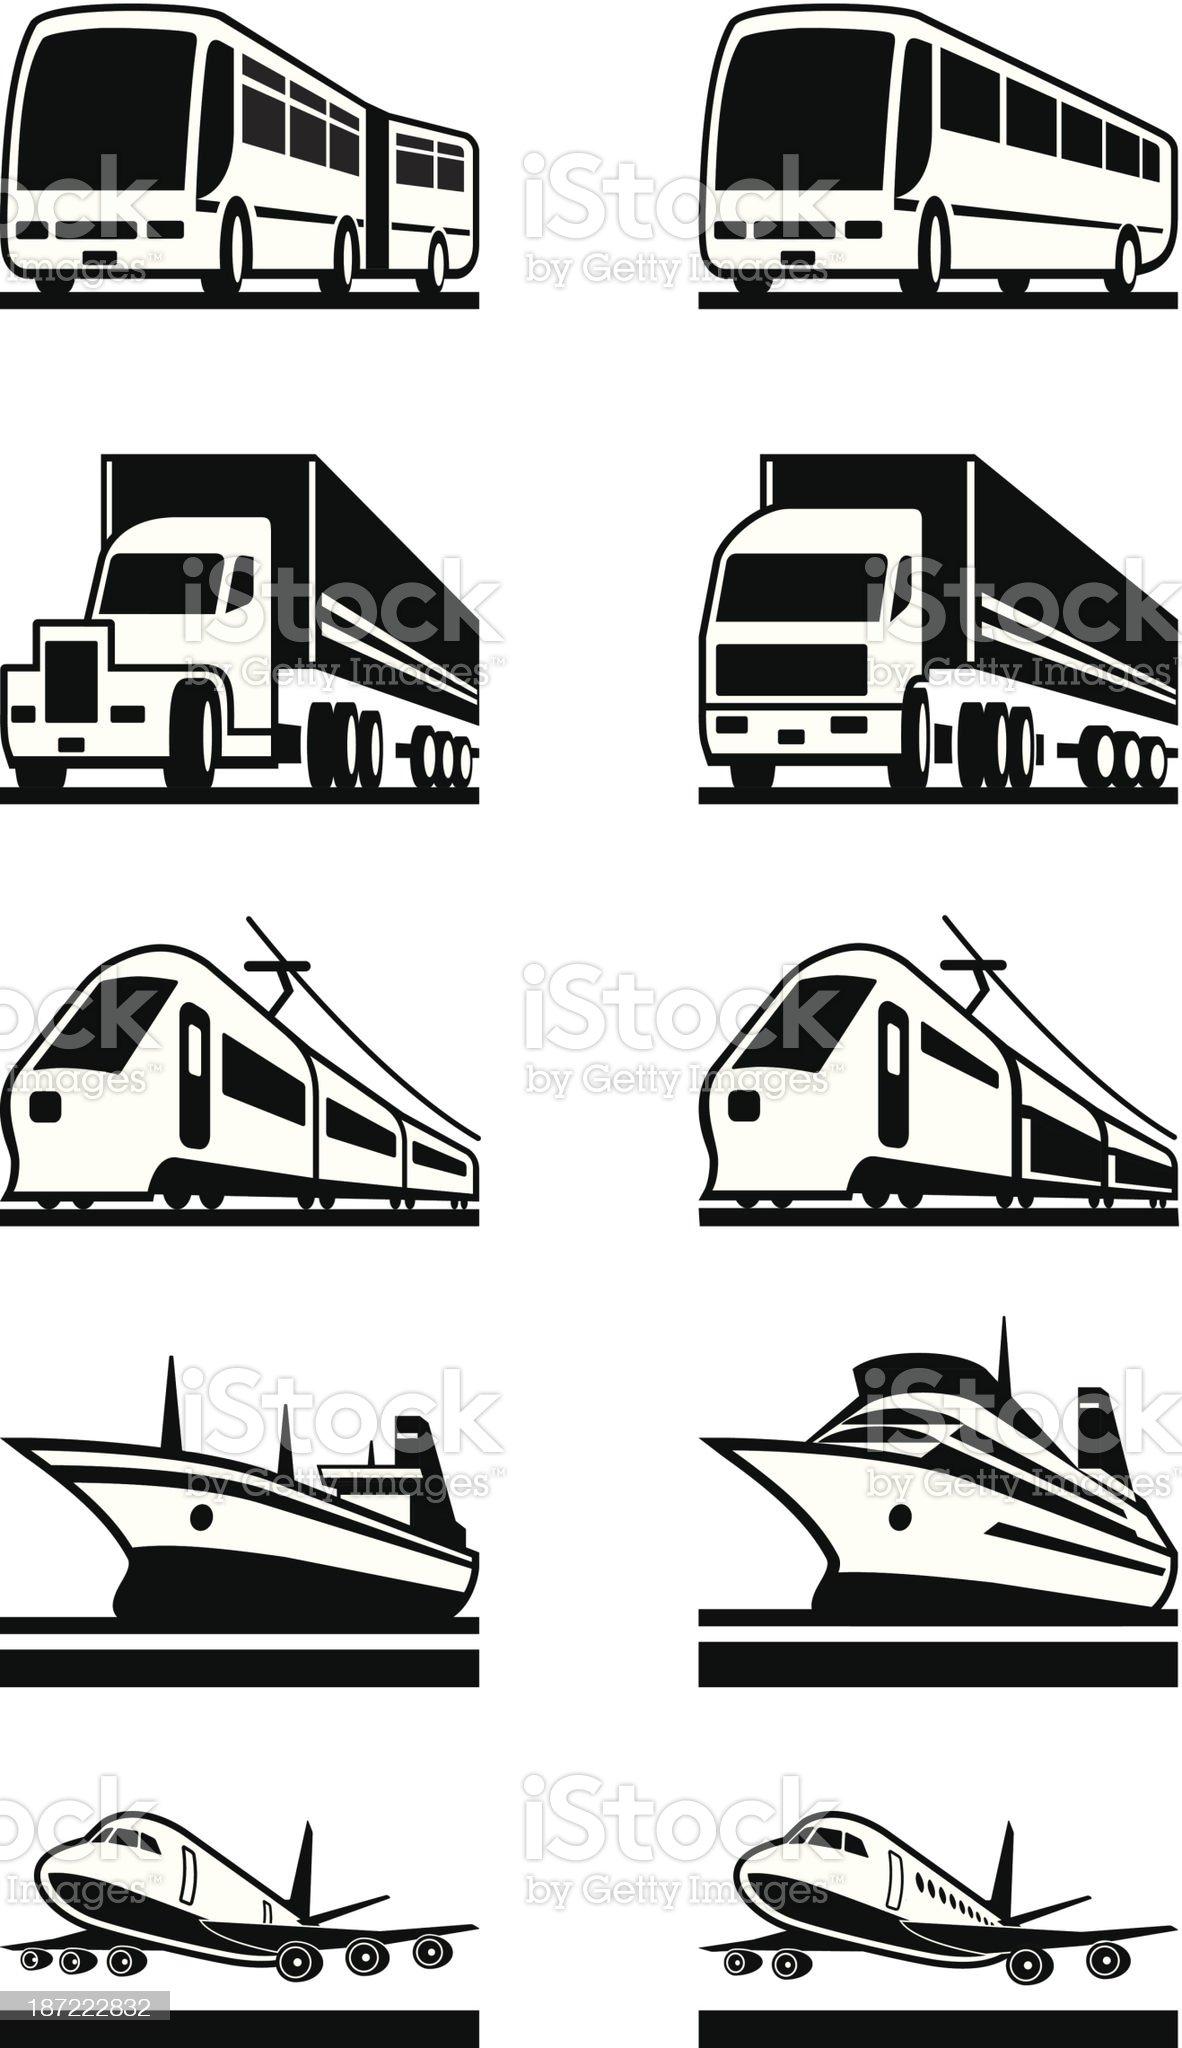 Passenger and cargo transportation royalty-free stock vector art